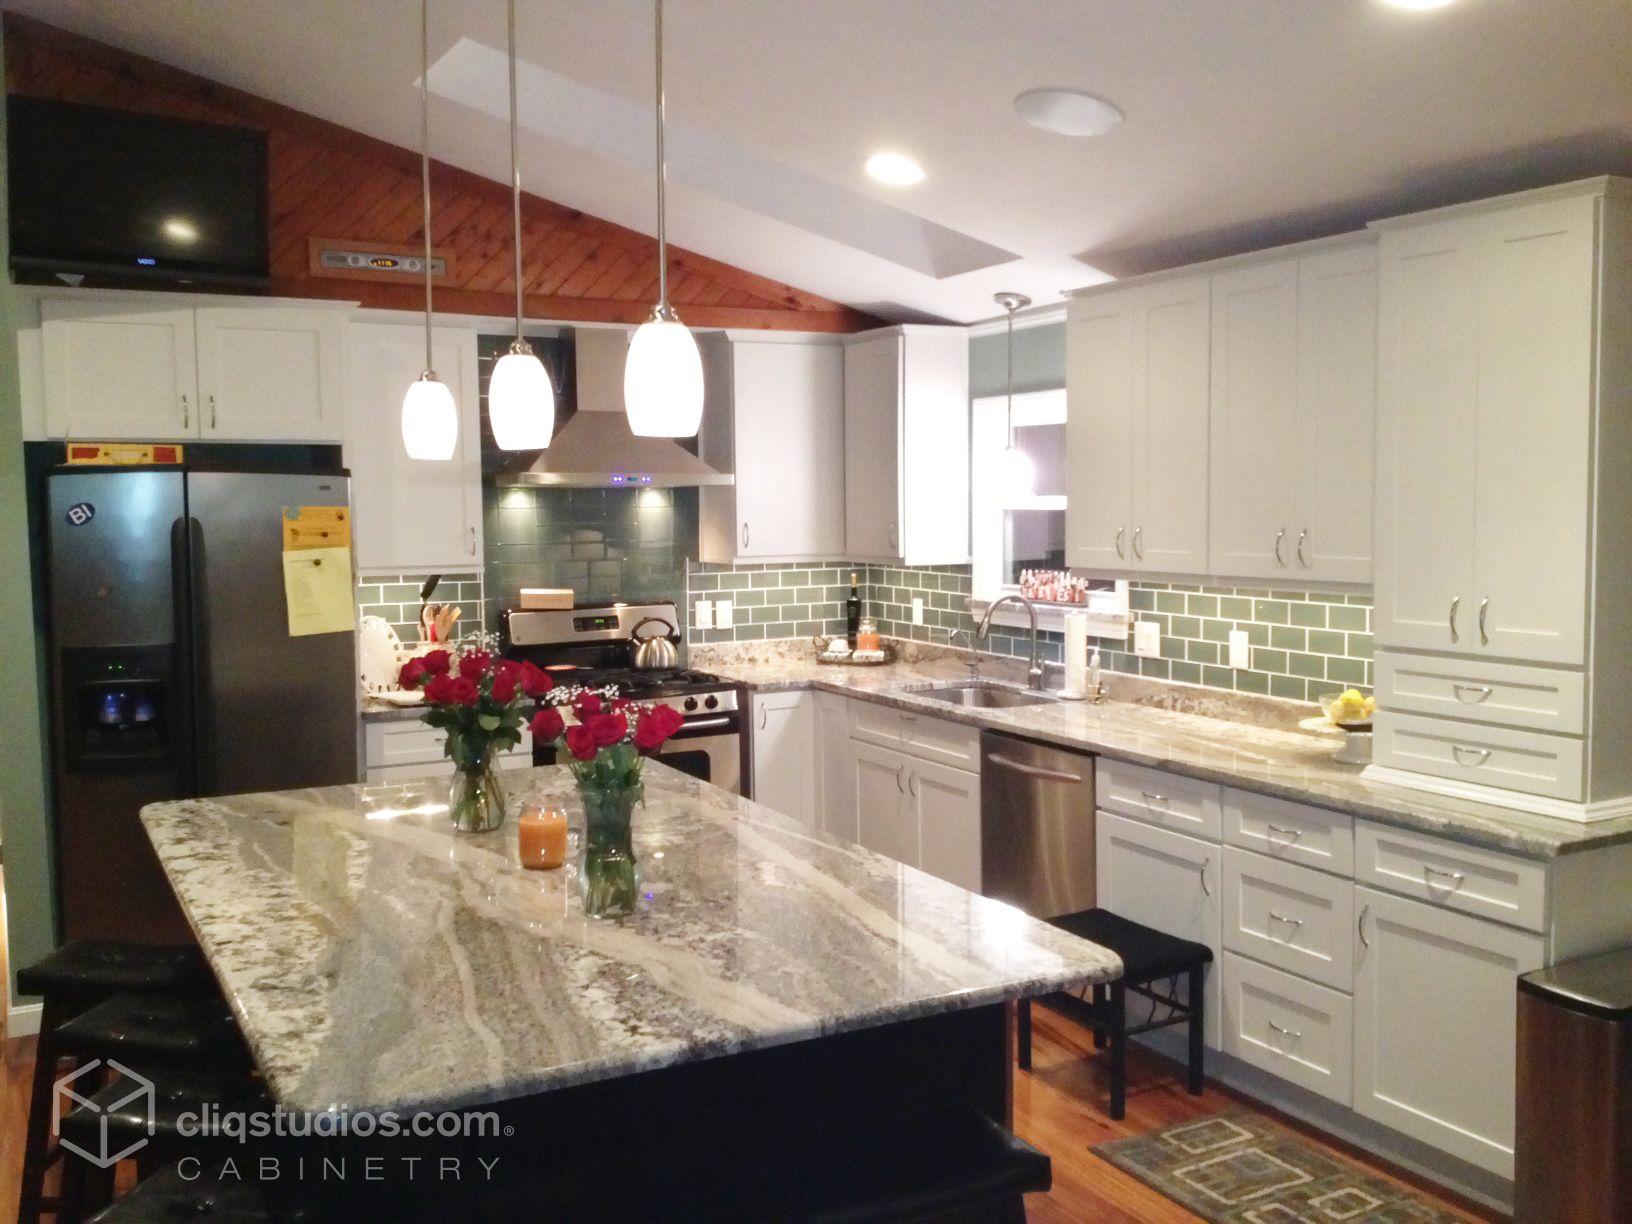 Modern Kitchen Update Featuring Dayton Painted White Mission